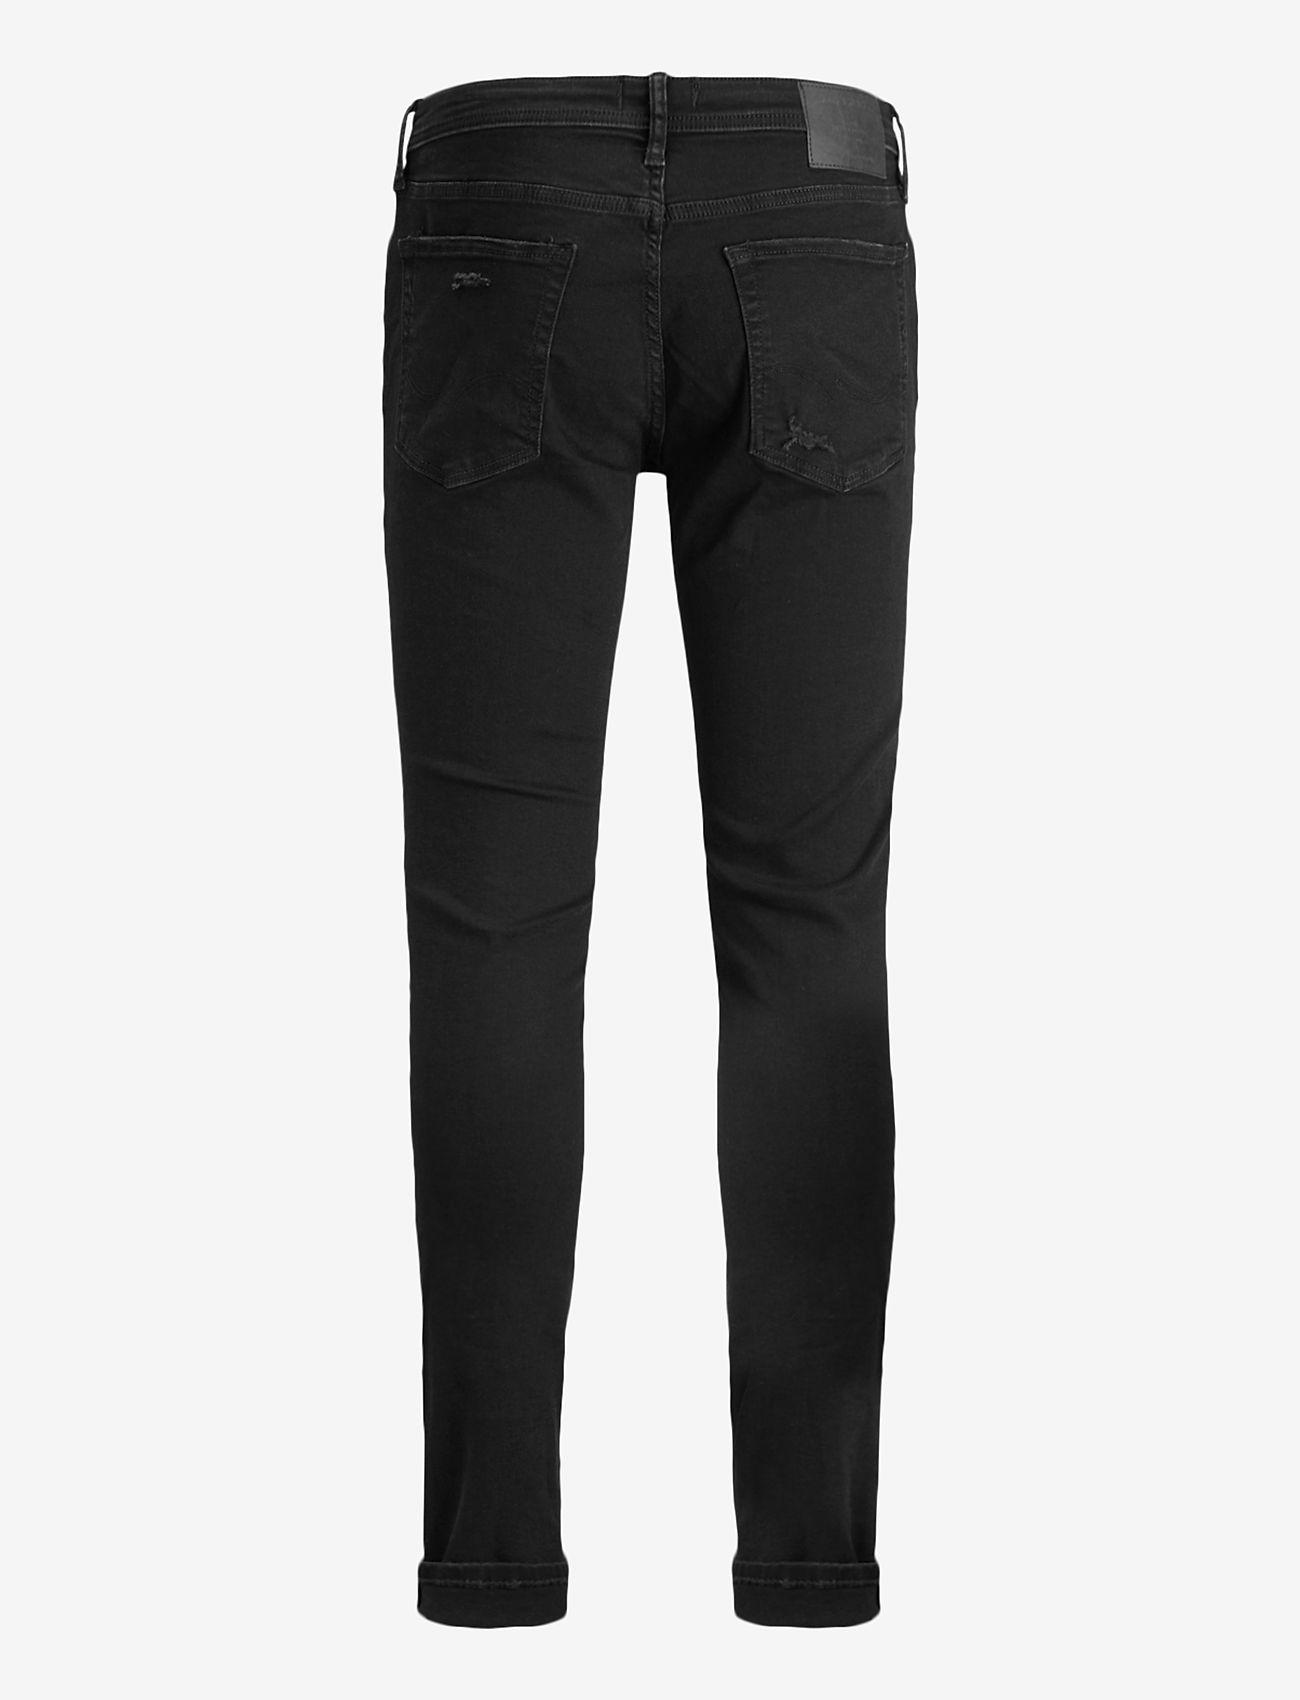 Jack & Jones - JJILIAM JJORIGINAL AM 502 50 SPS NOOS - skinny jeans - black denim - 1